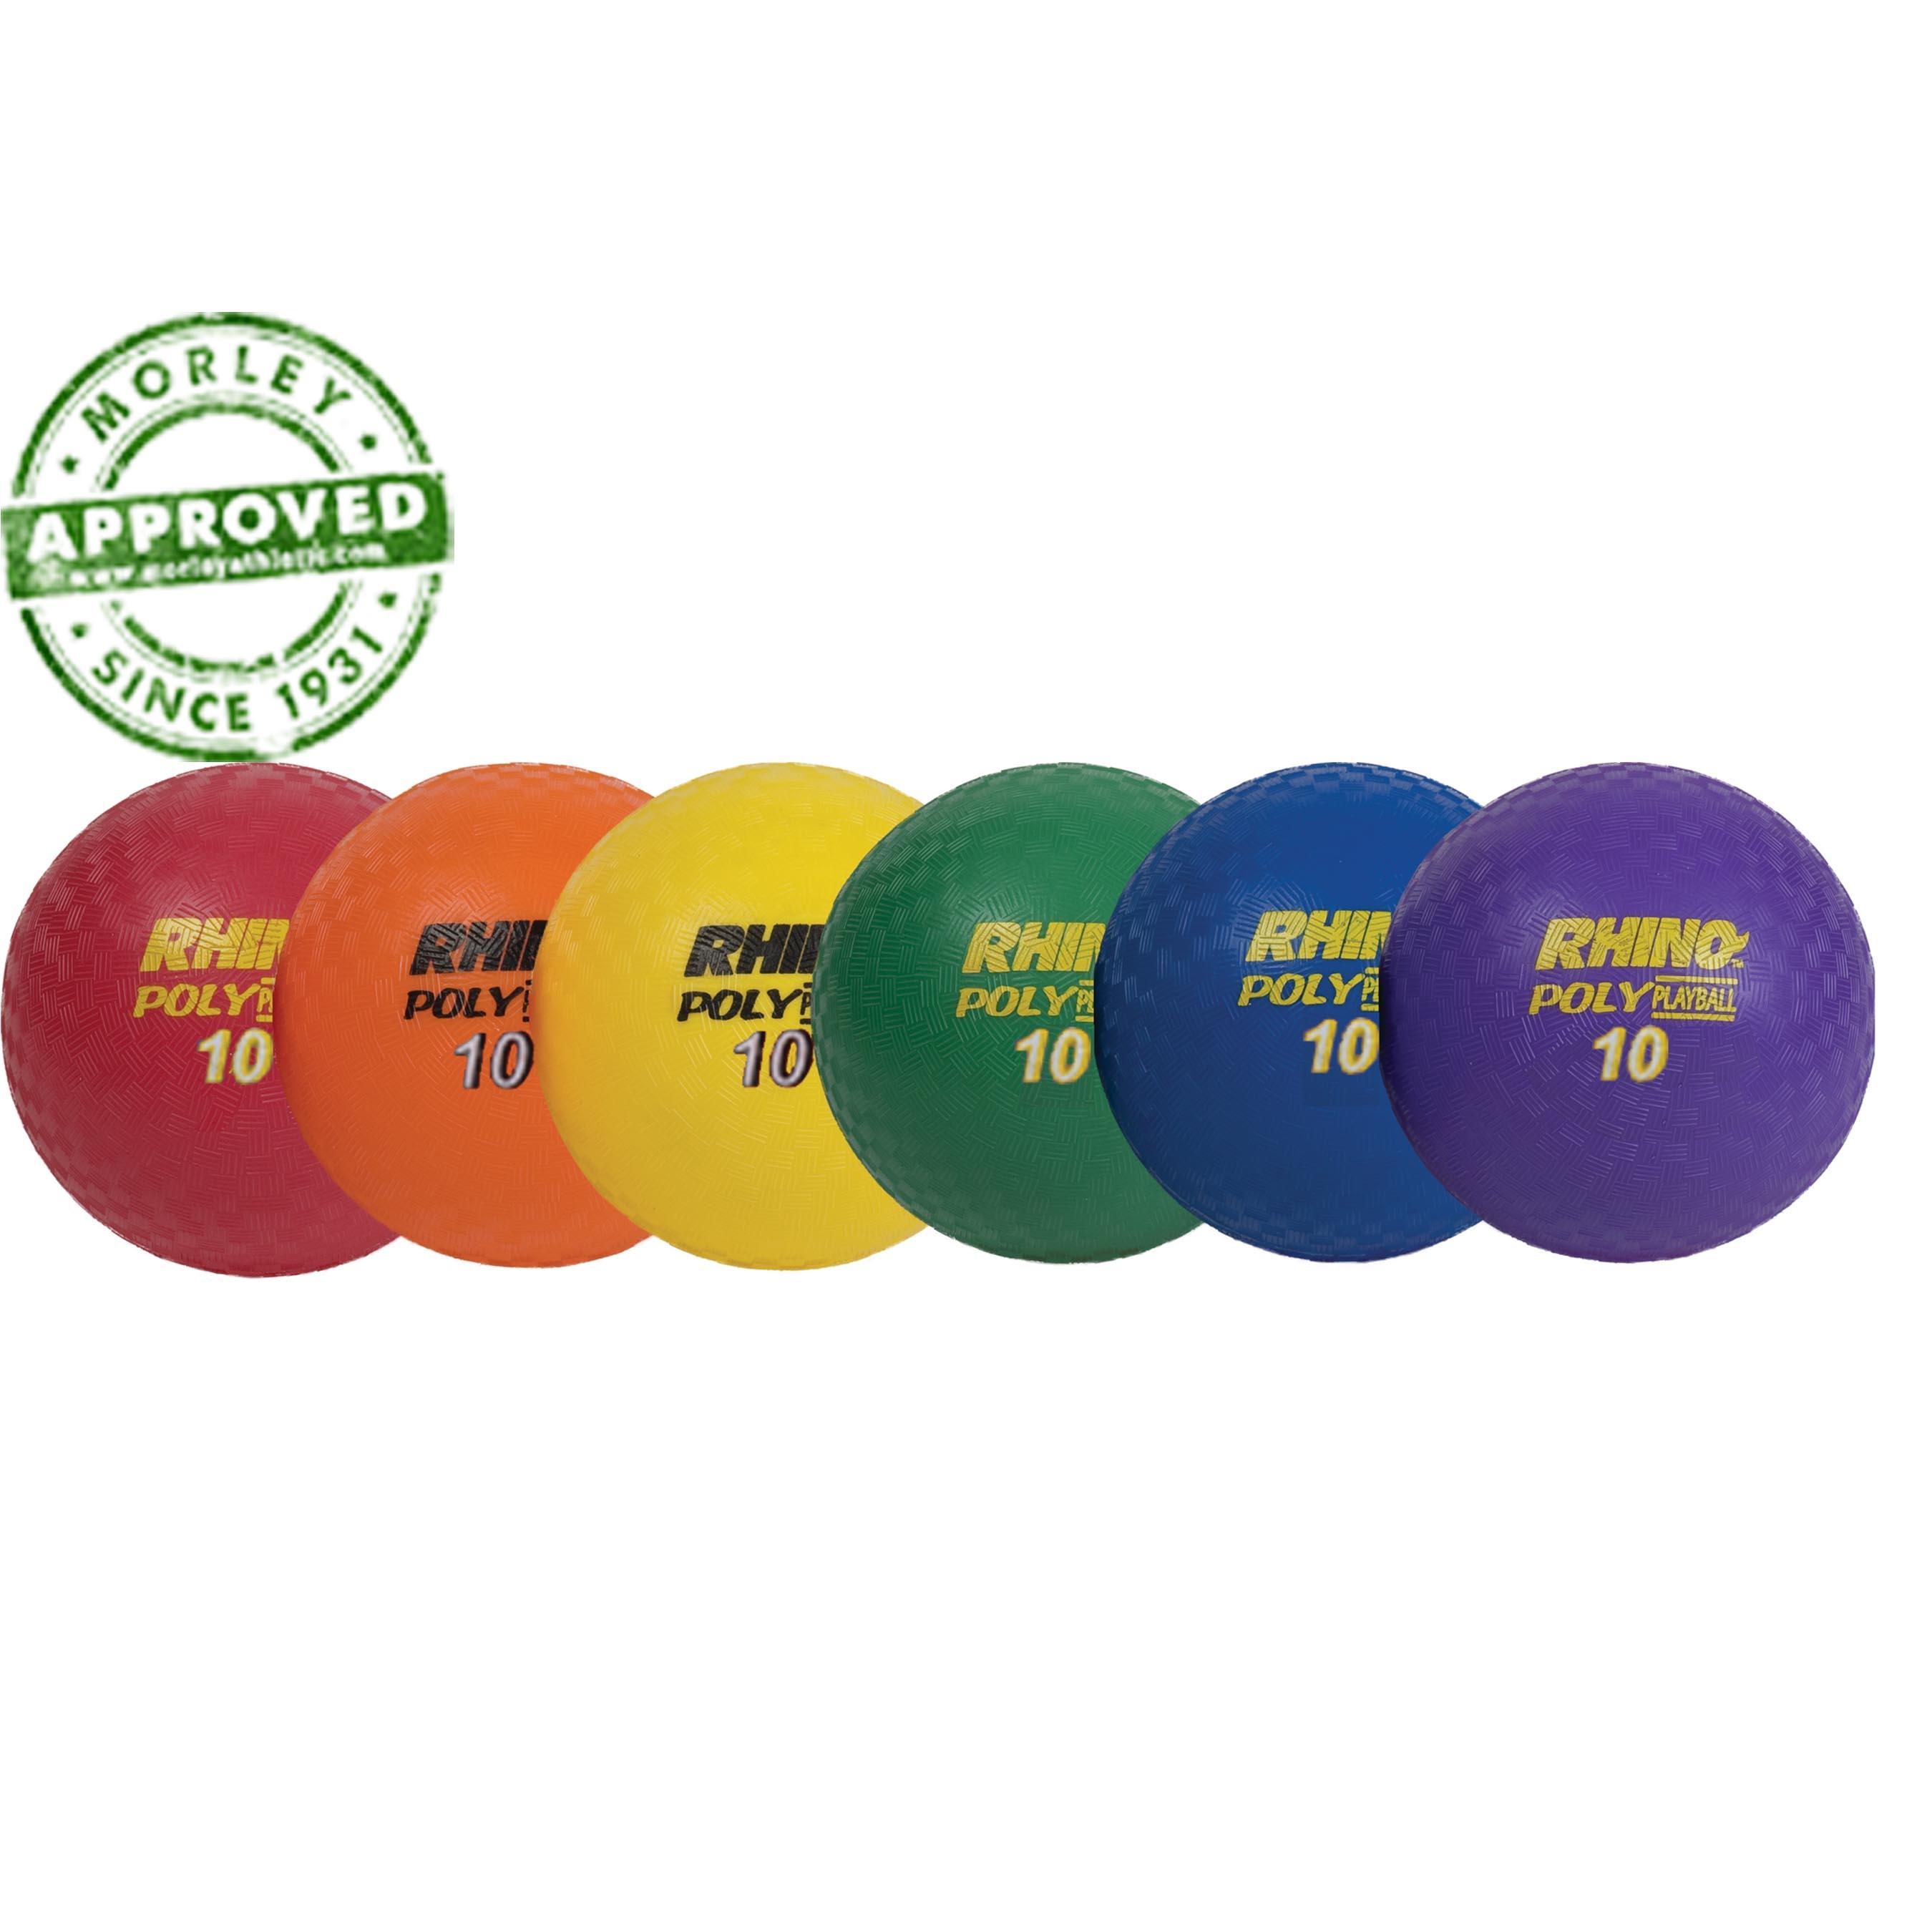 "10"" Rhinoâ® Poly Rotationally Molded Playground Ball"